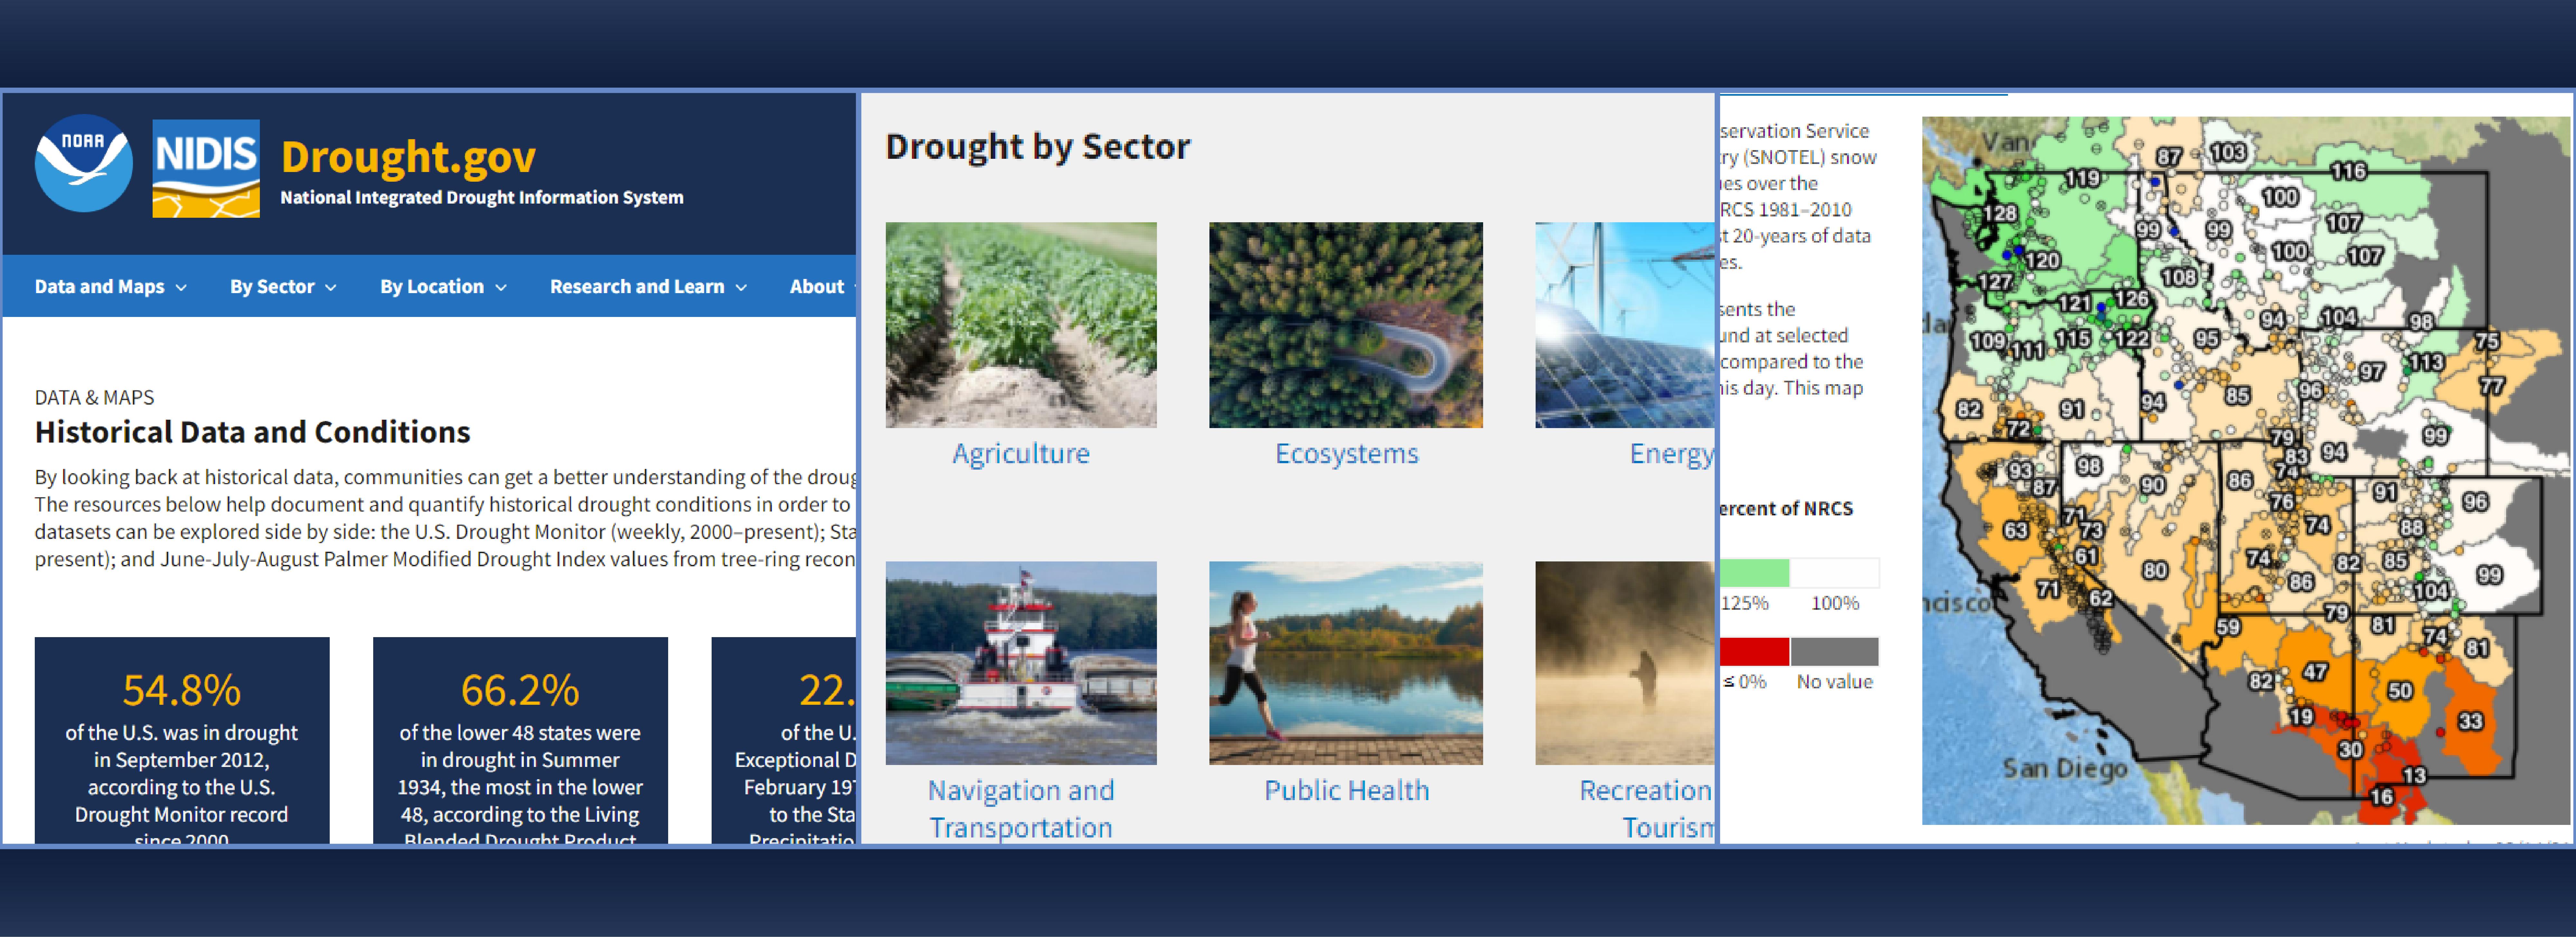 Drought.gov new website